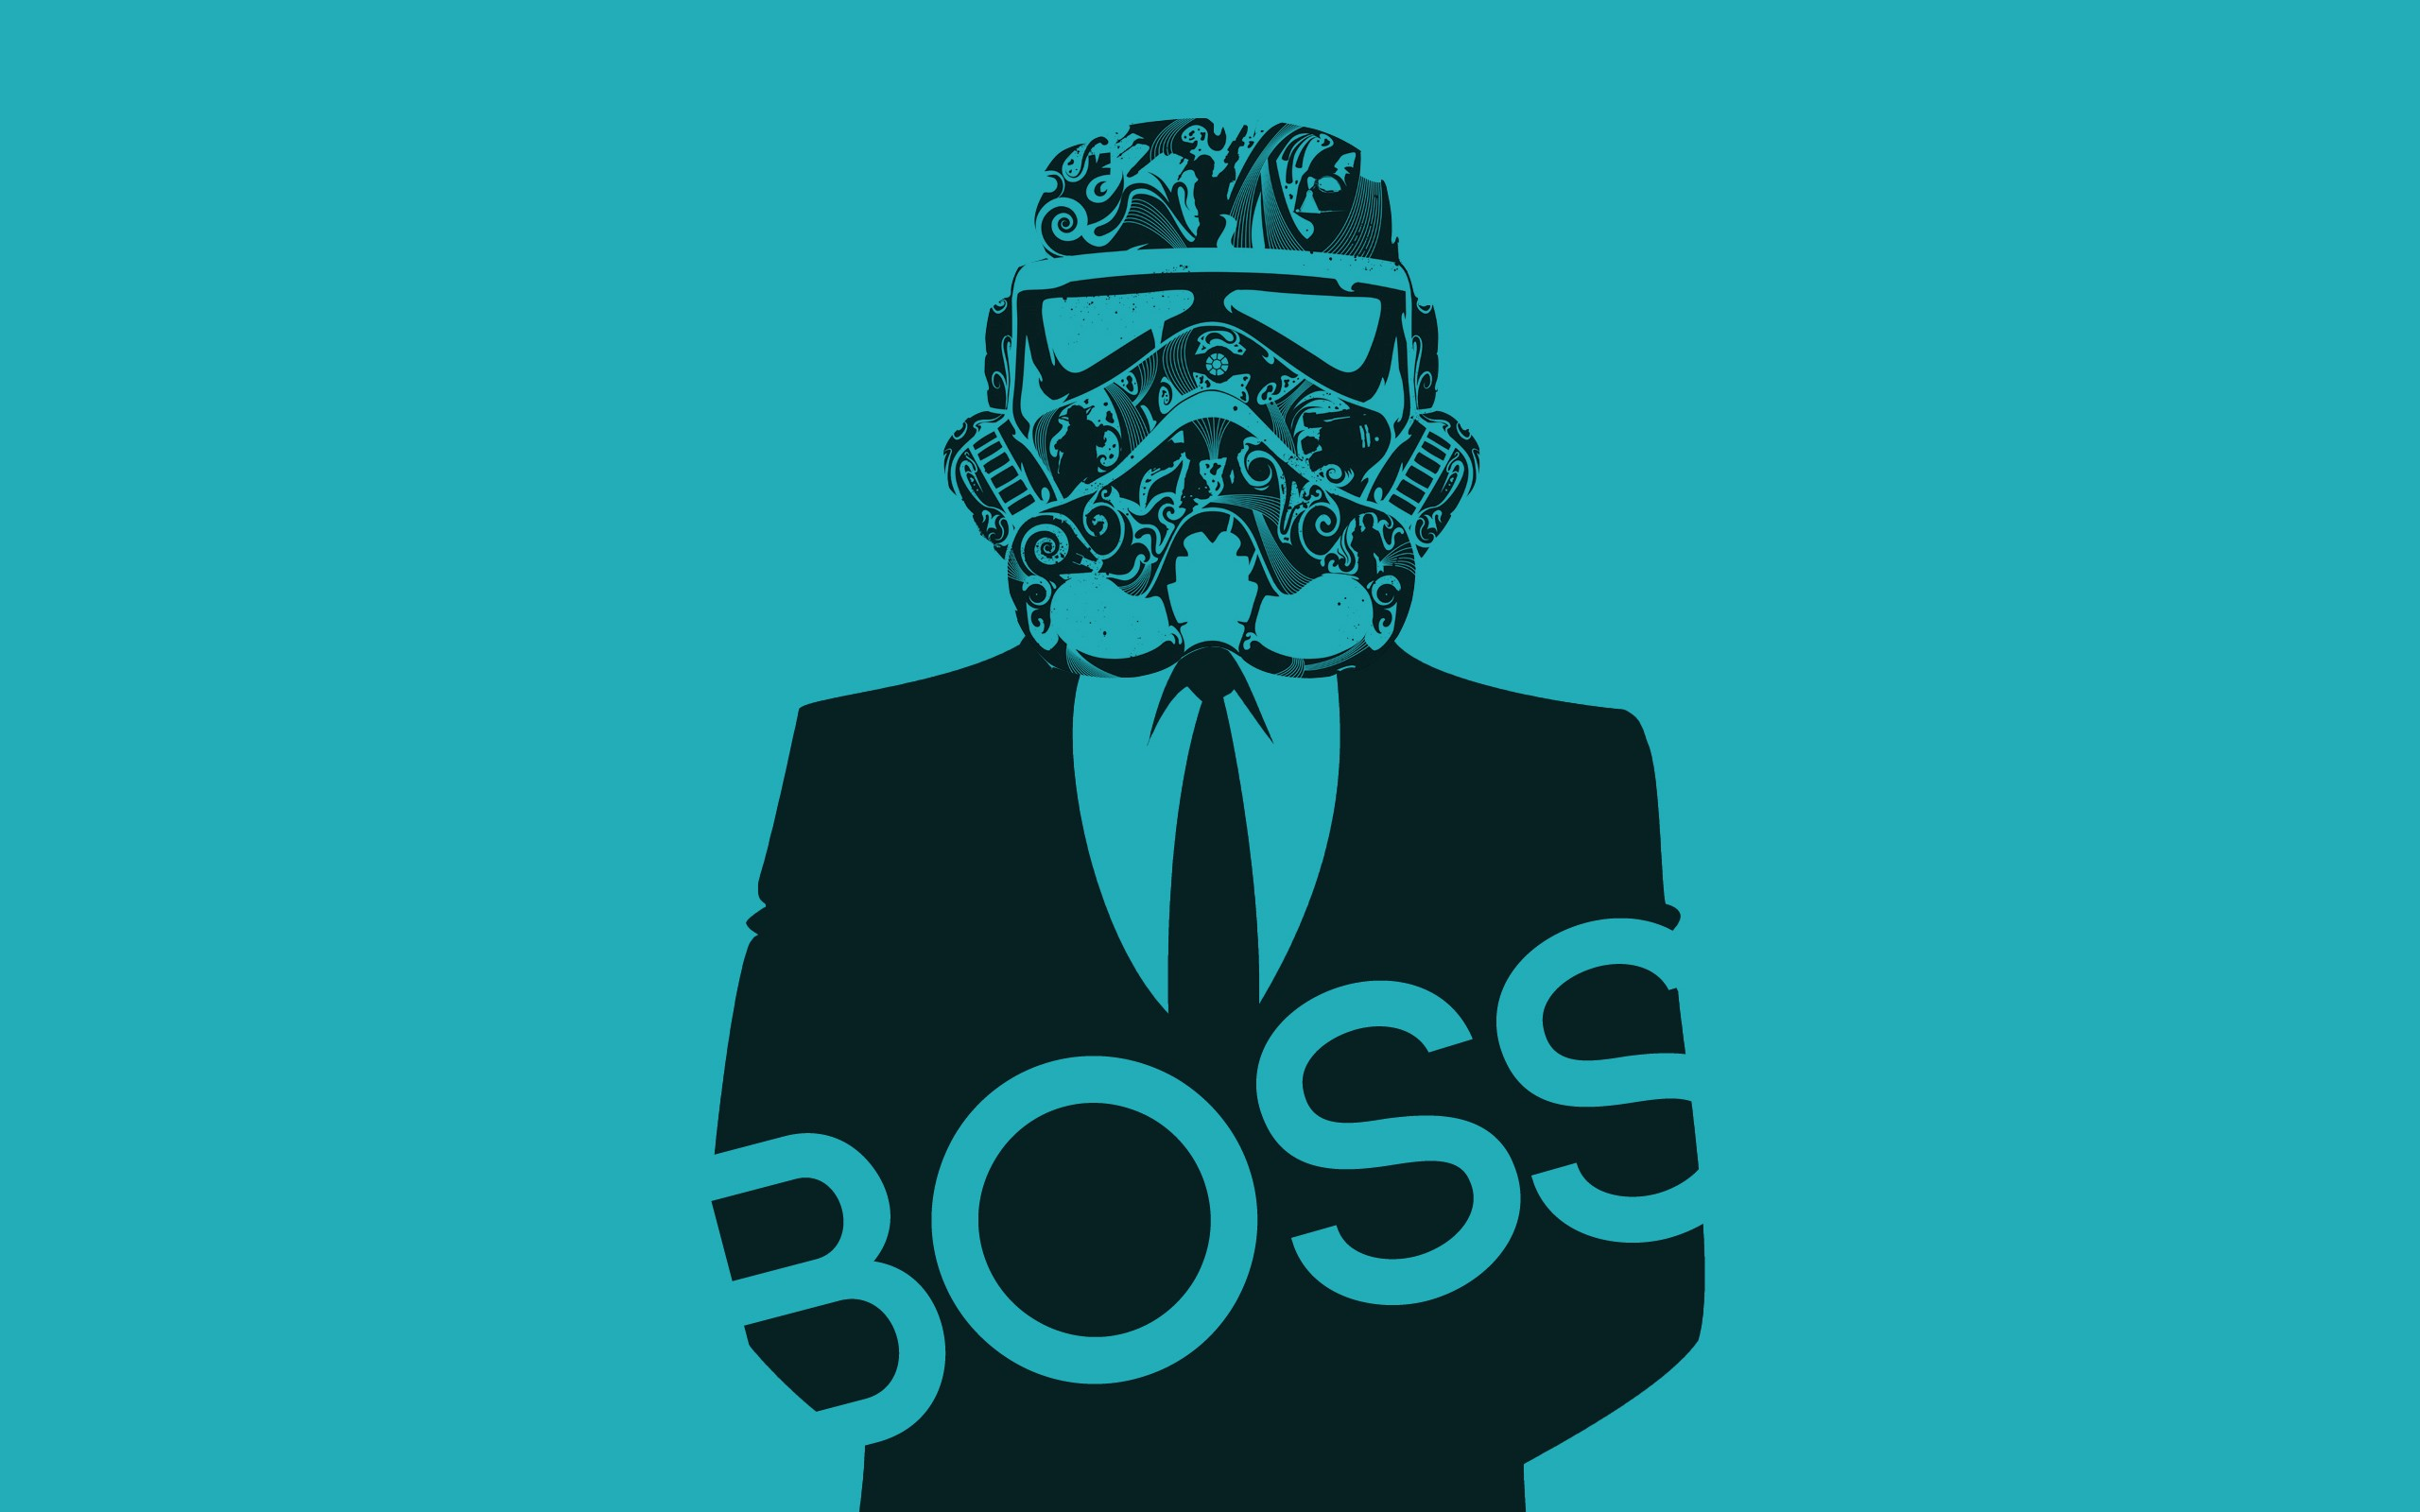 Boss pics galleries 8